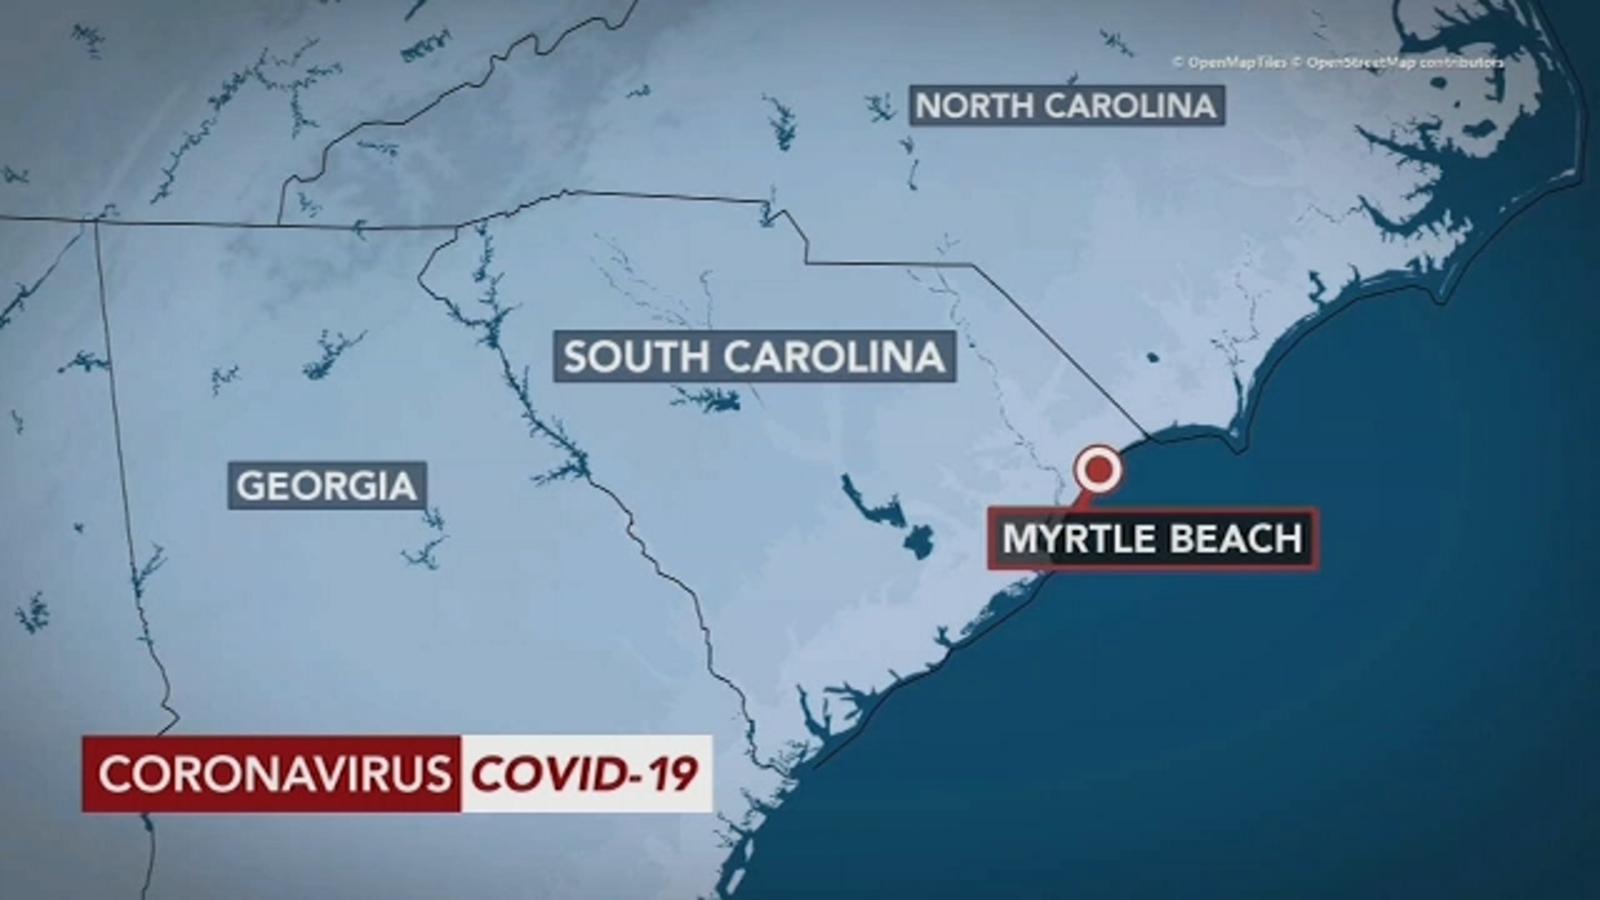 6304250 070720 wpvi myrtle covid map img jpg?w=1600.'